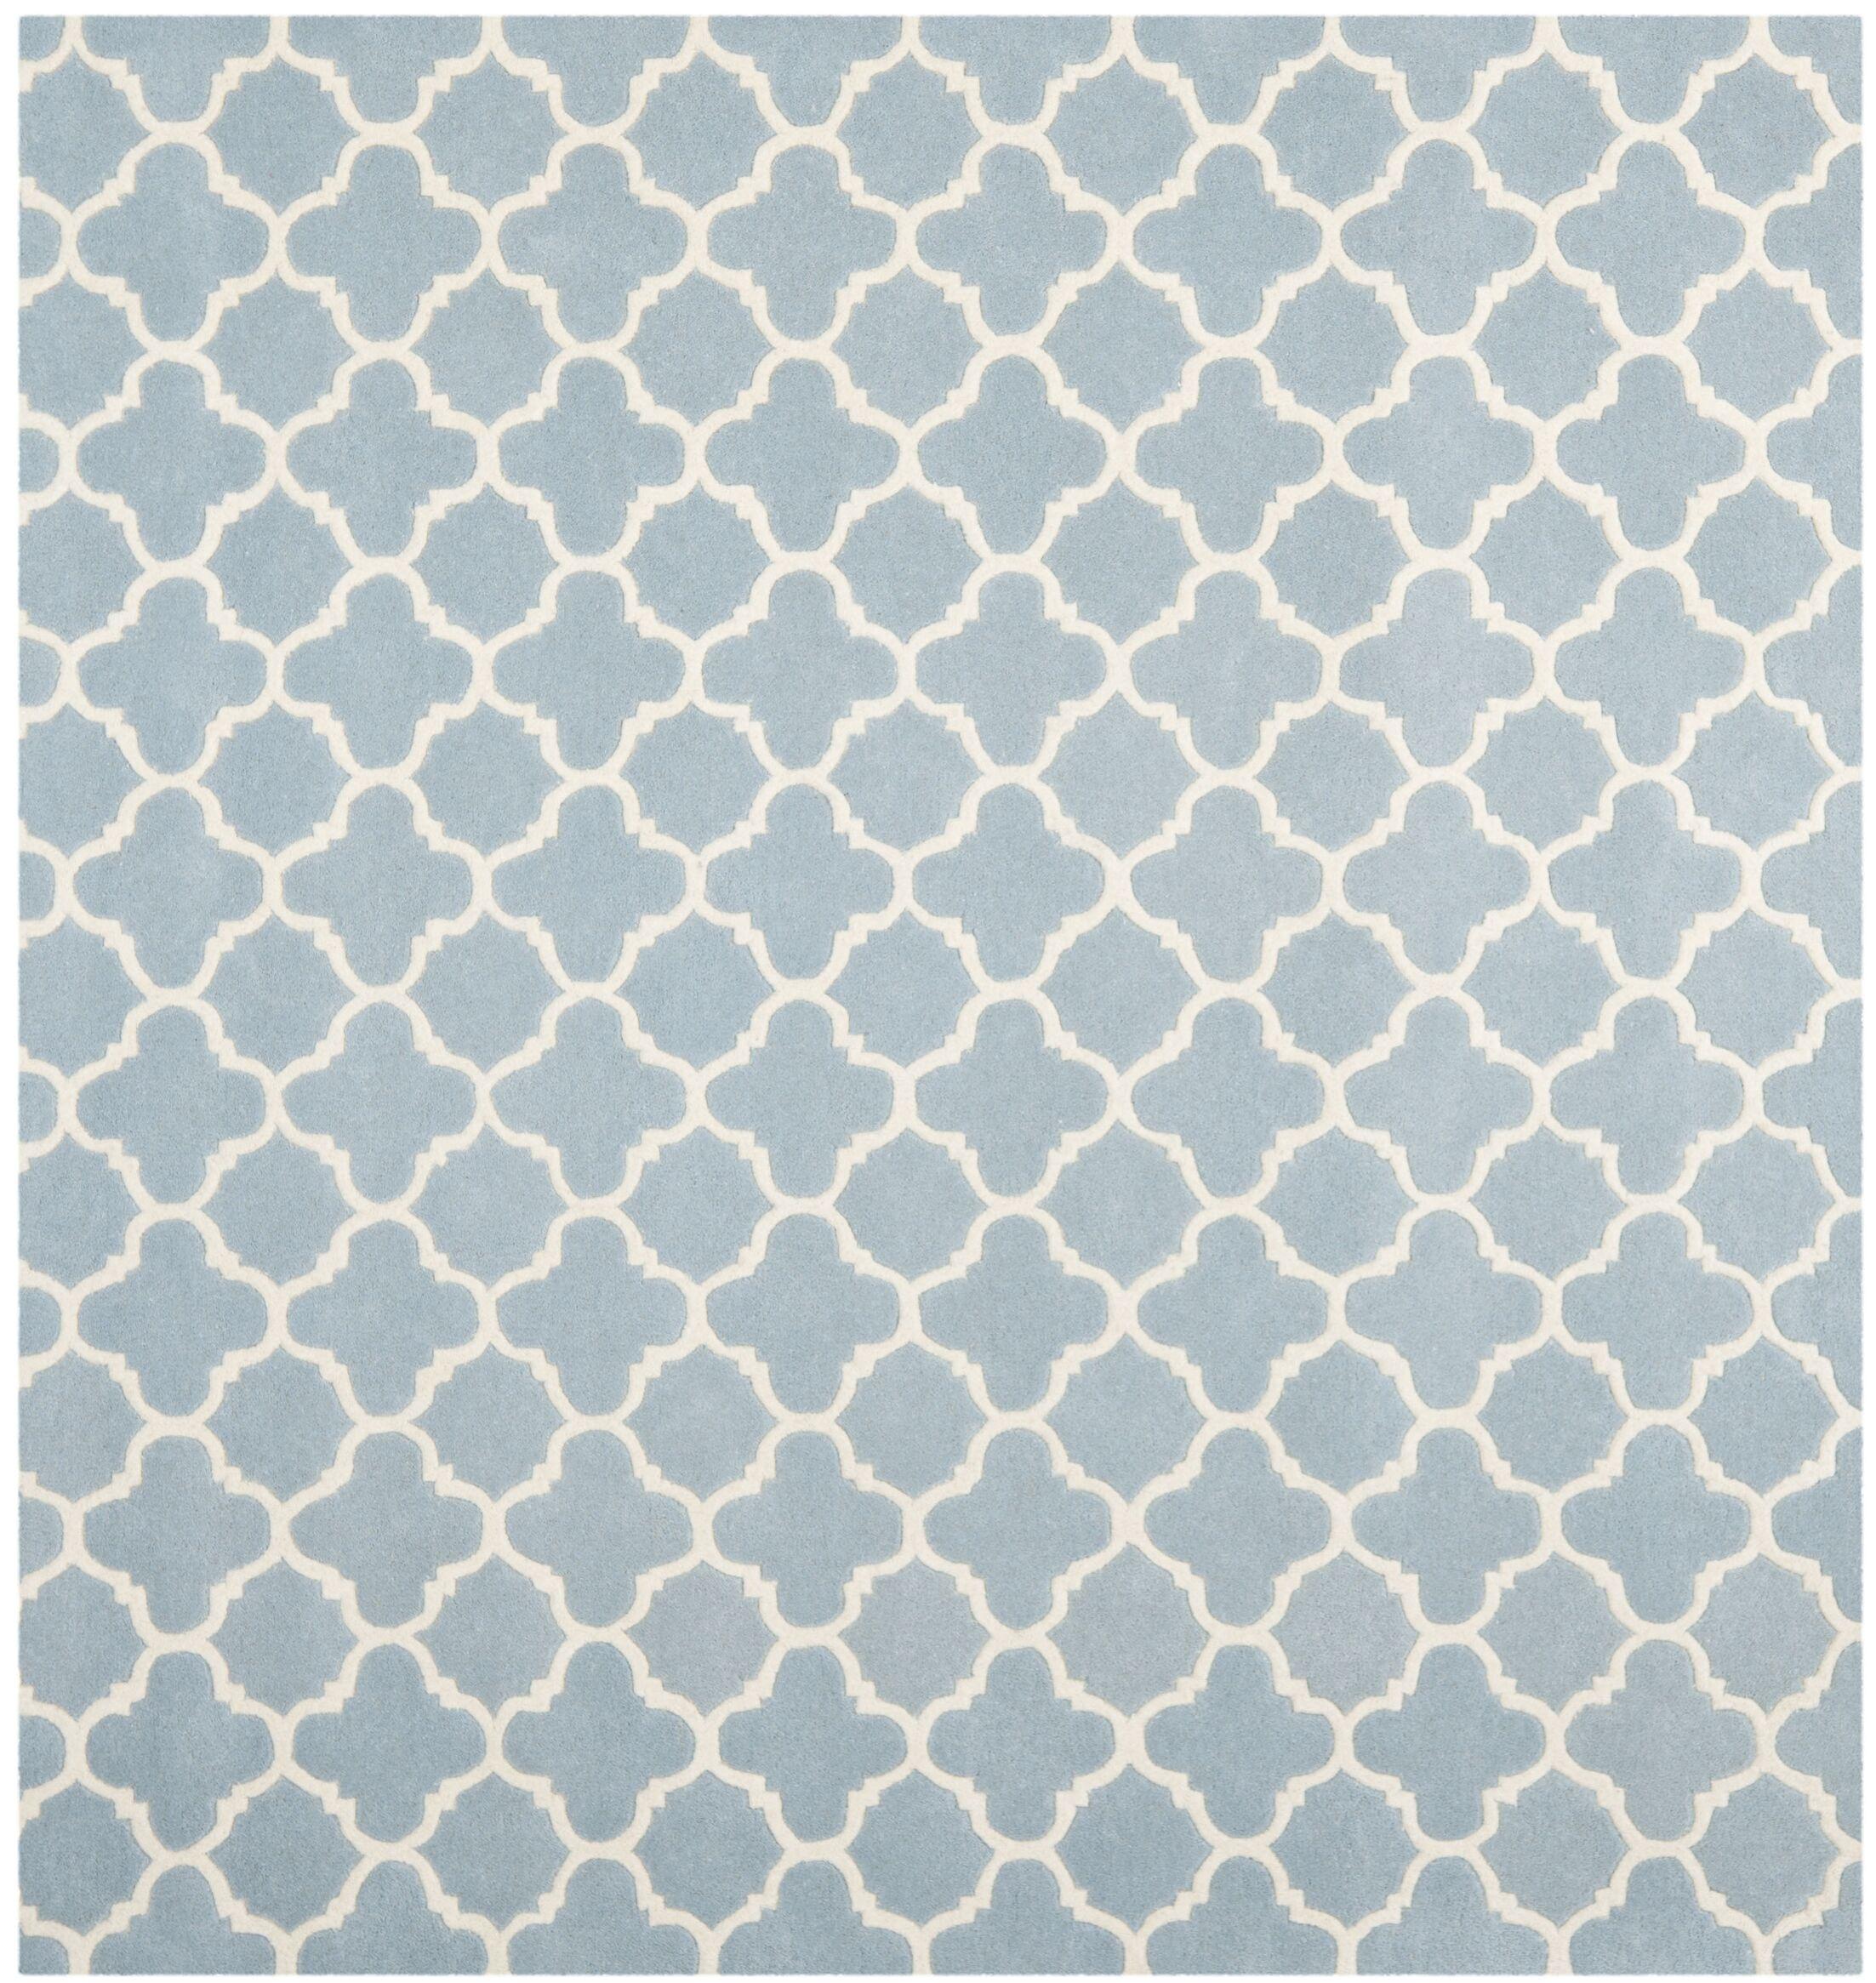 Wilkin Blue & Ivory Area Rug I Rug Size: Square 8'9